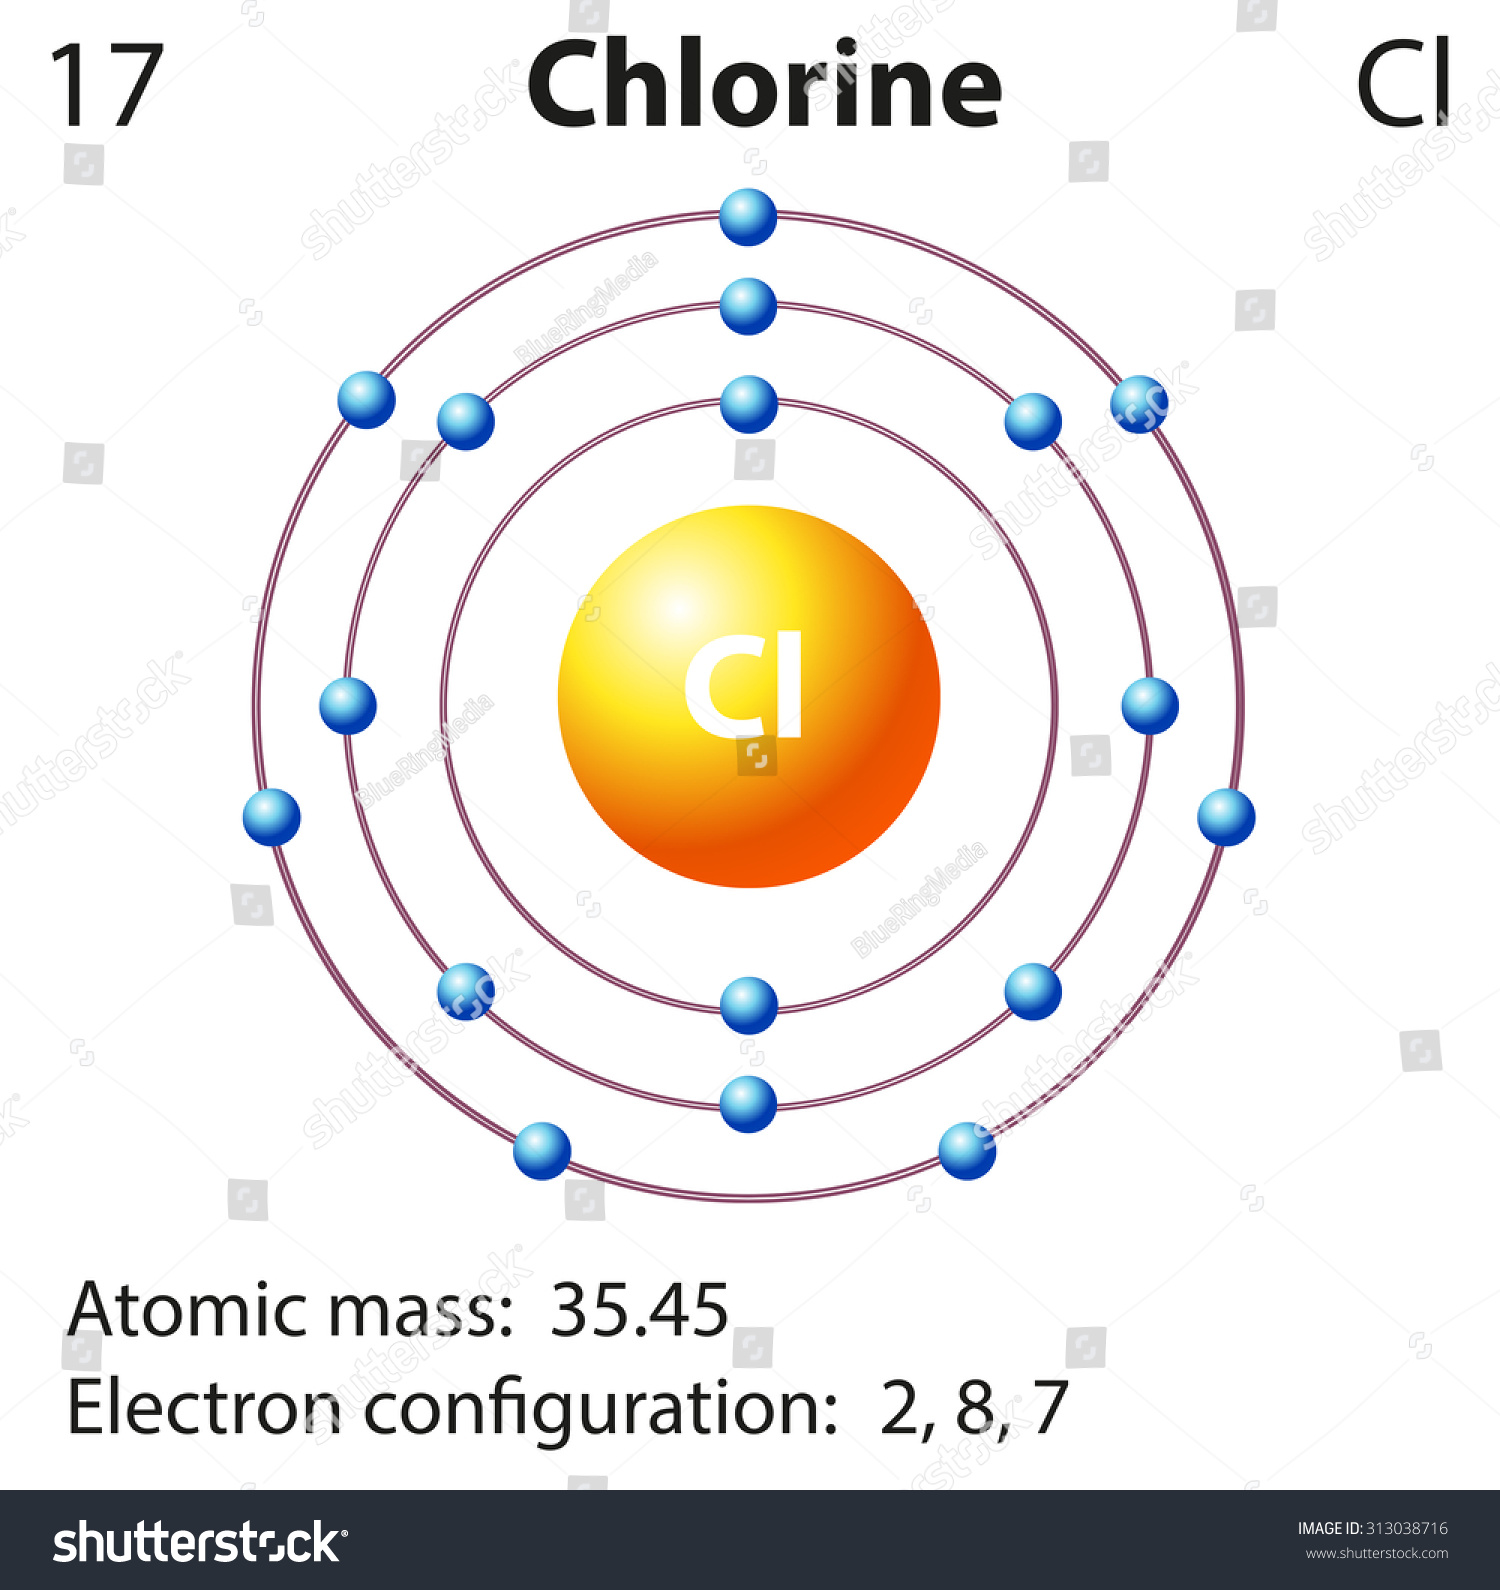 Diagram representation element chlorine illustration stock vector diagram representation of the element chlorine illustration ccuart Choice Image